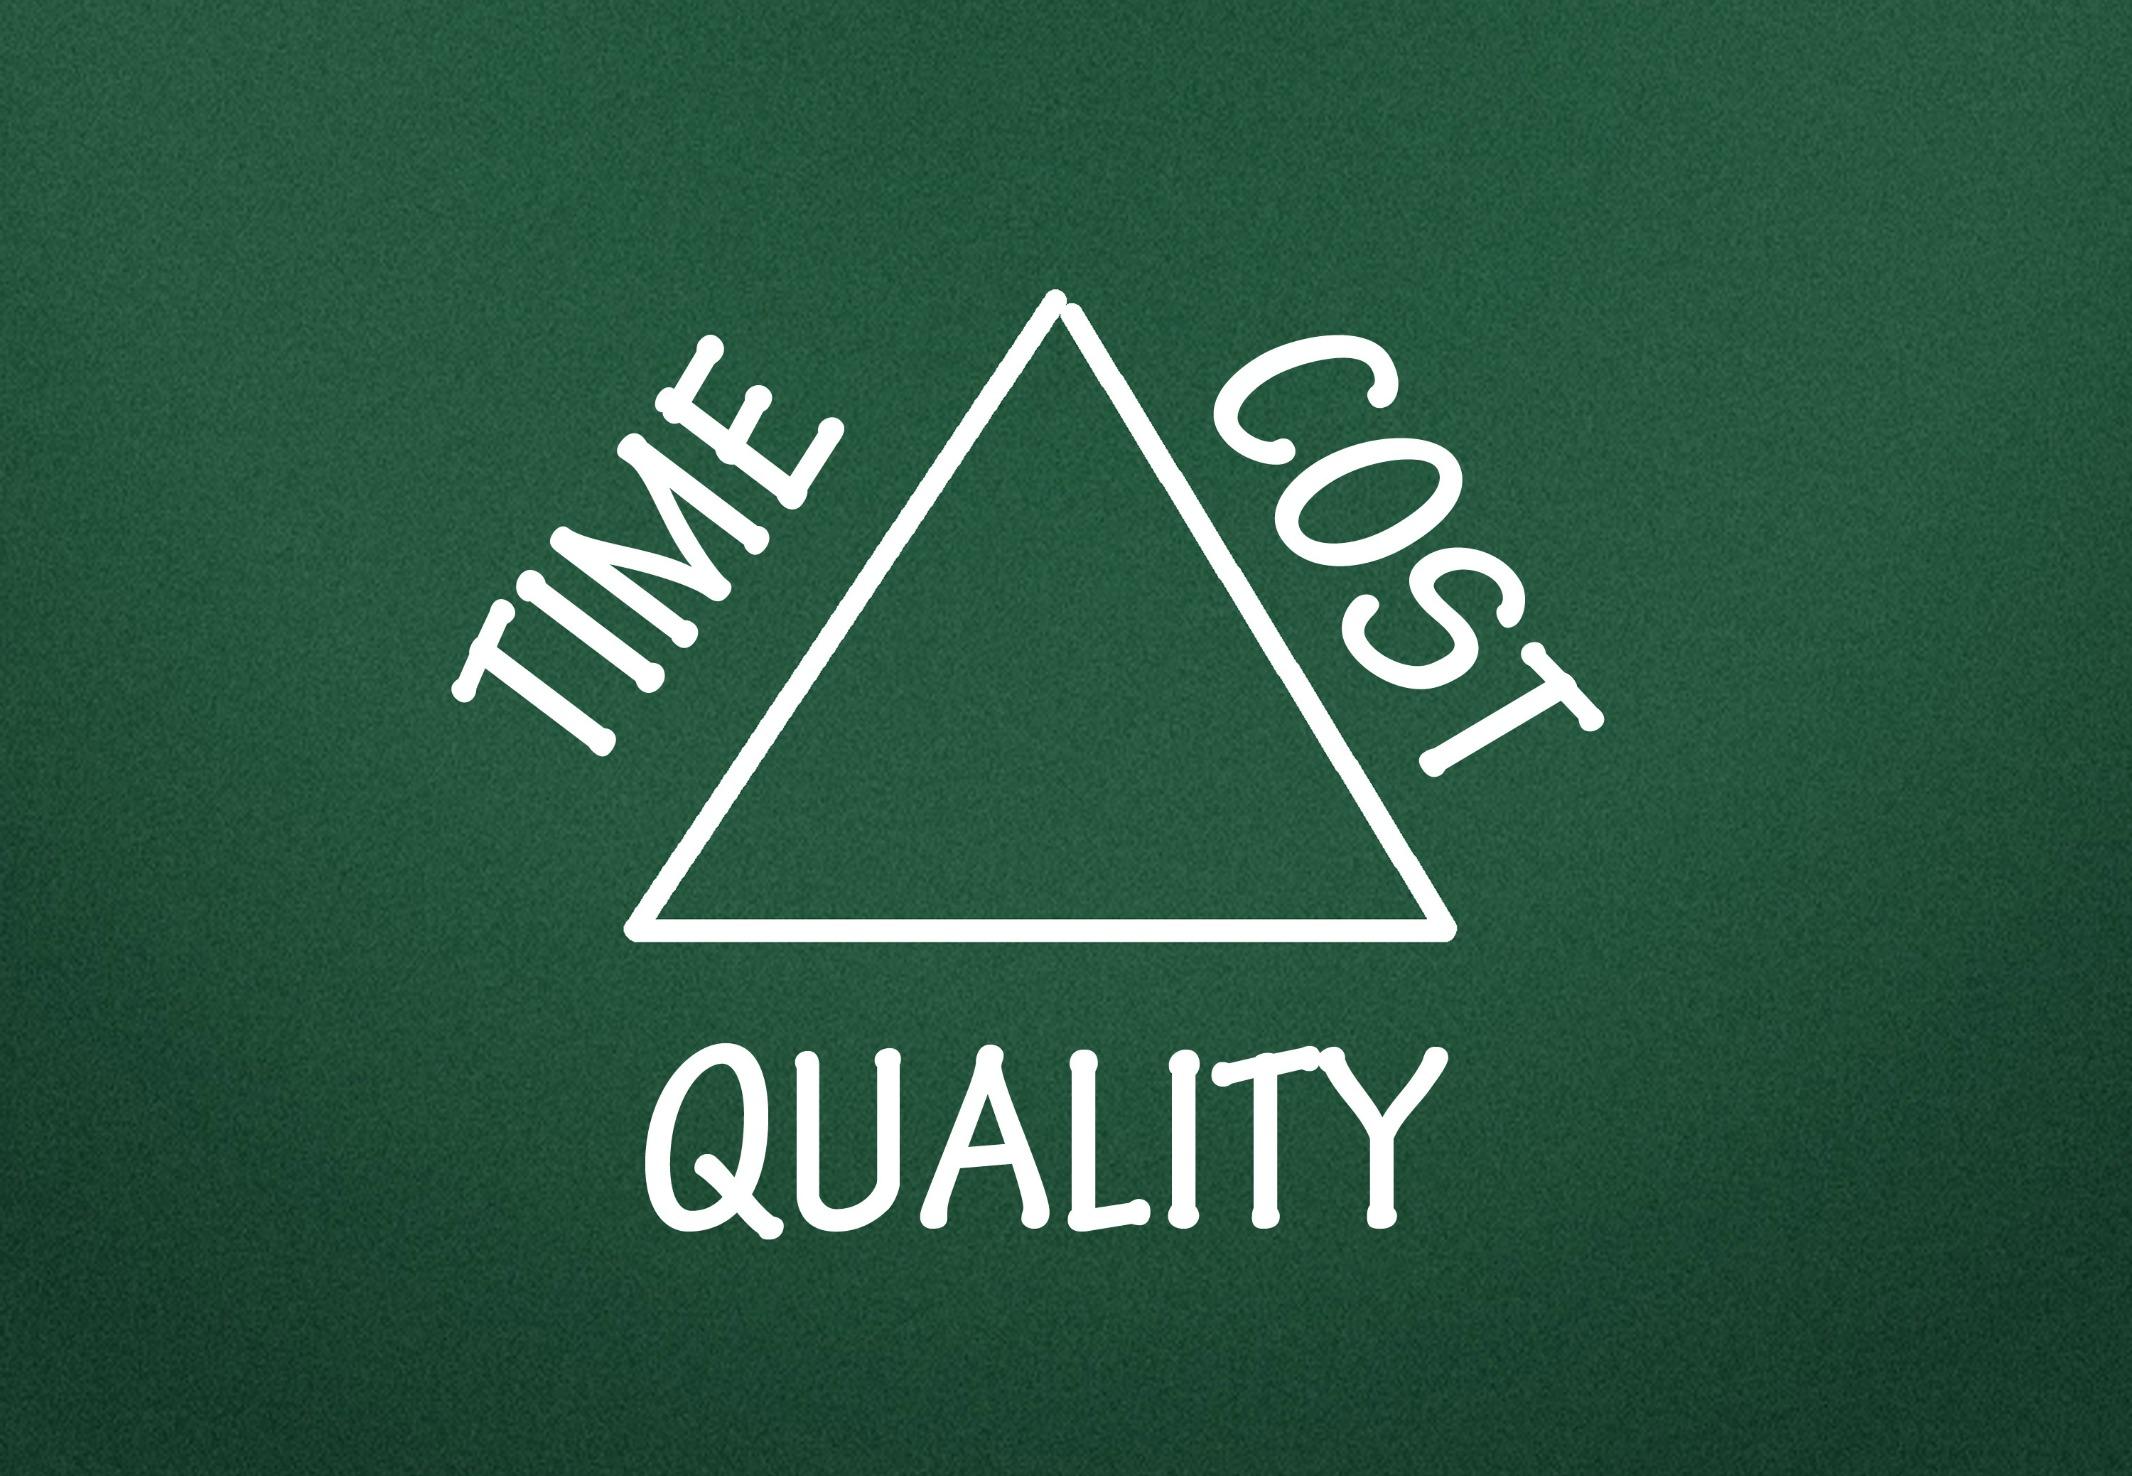 Integragen genomics quality research